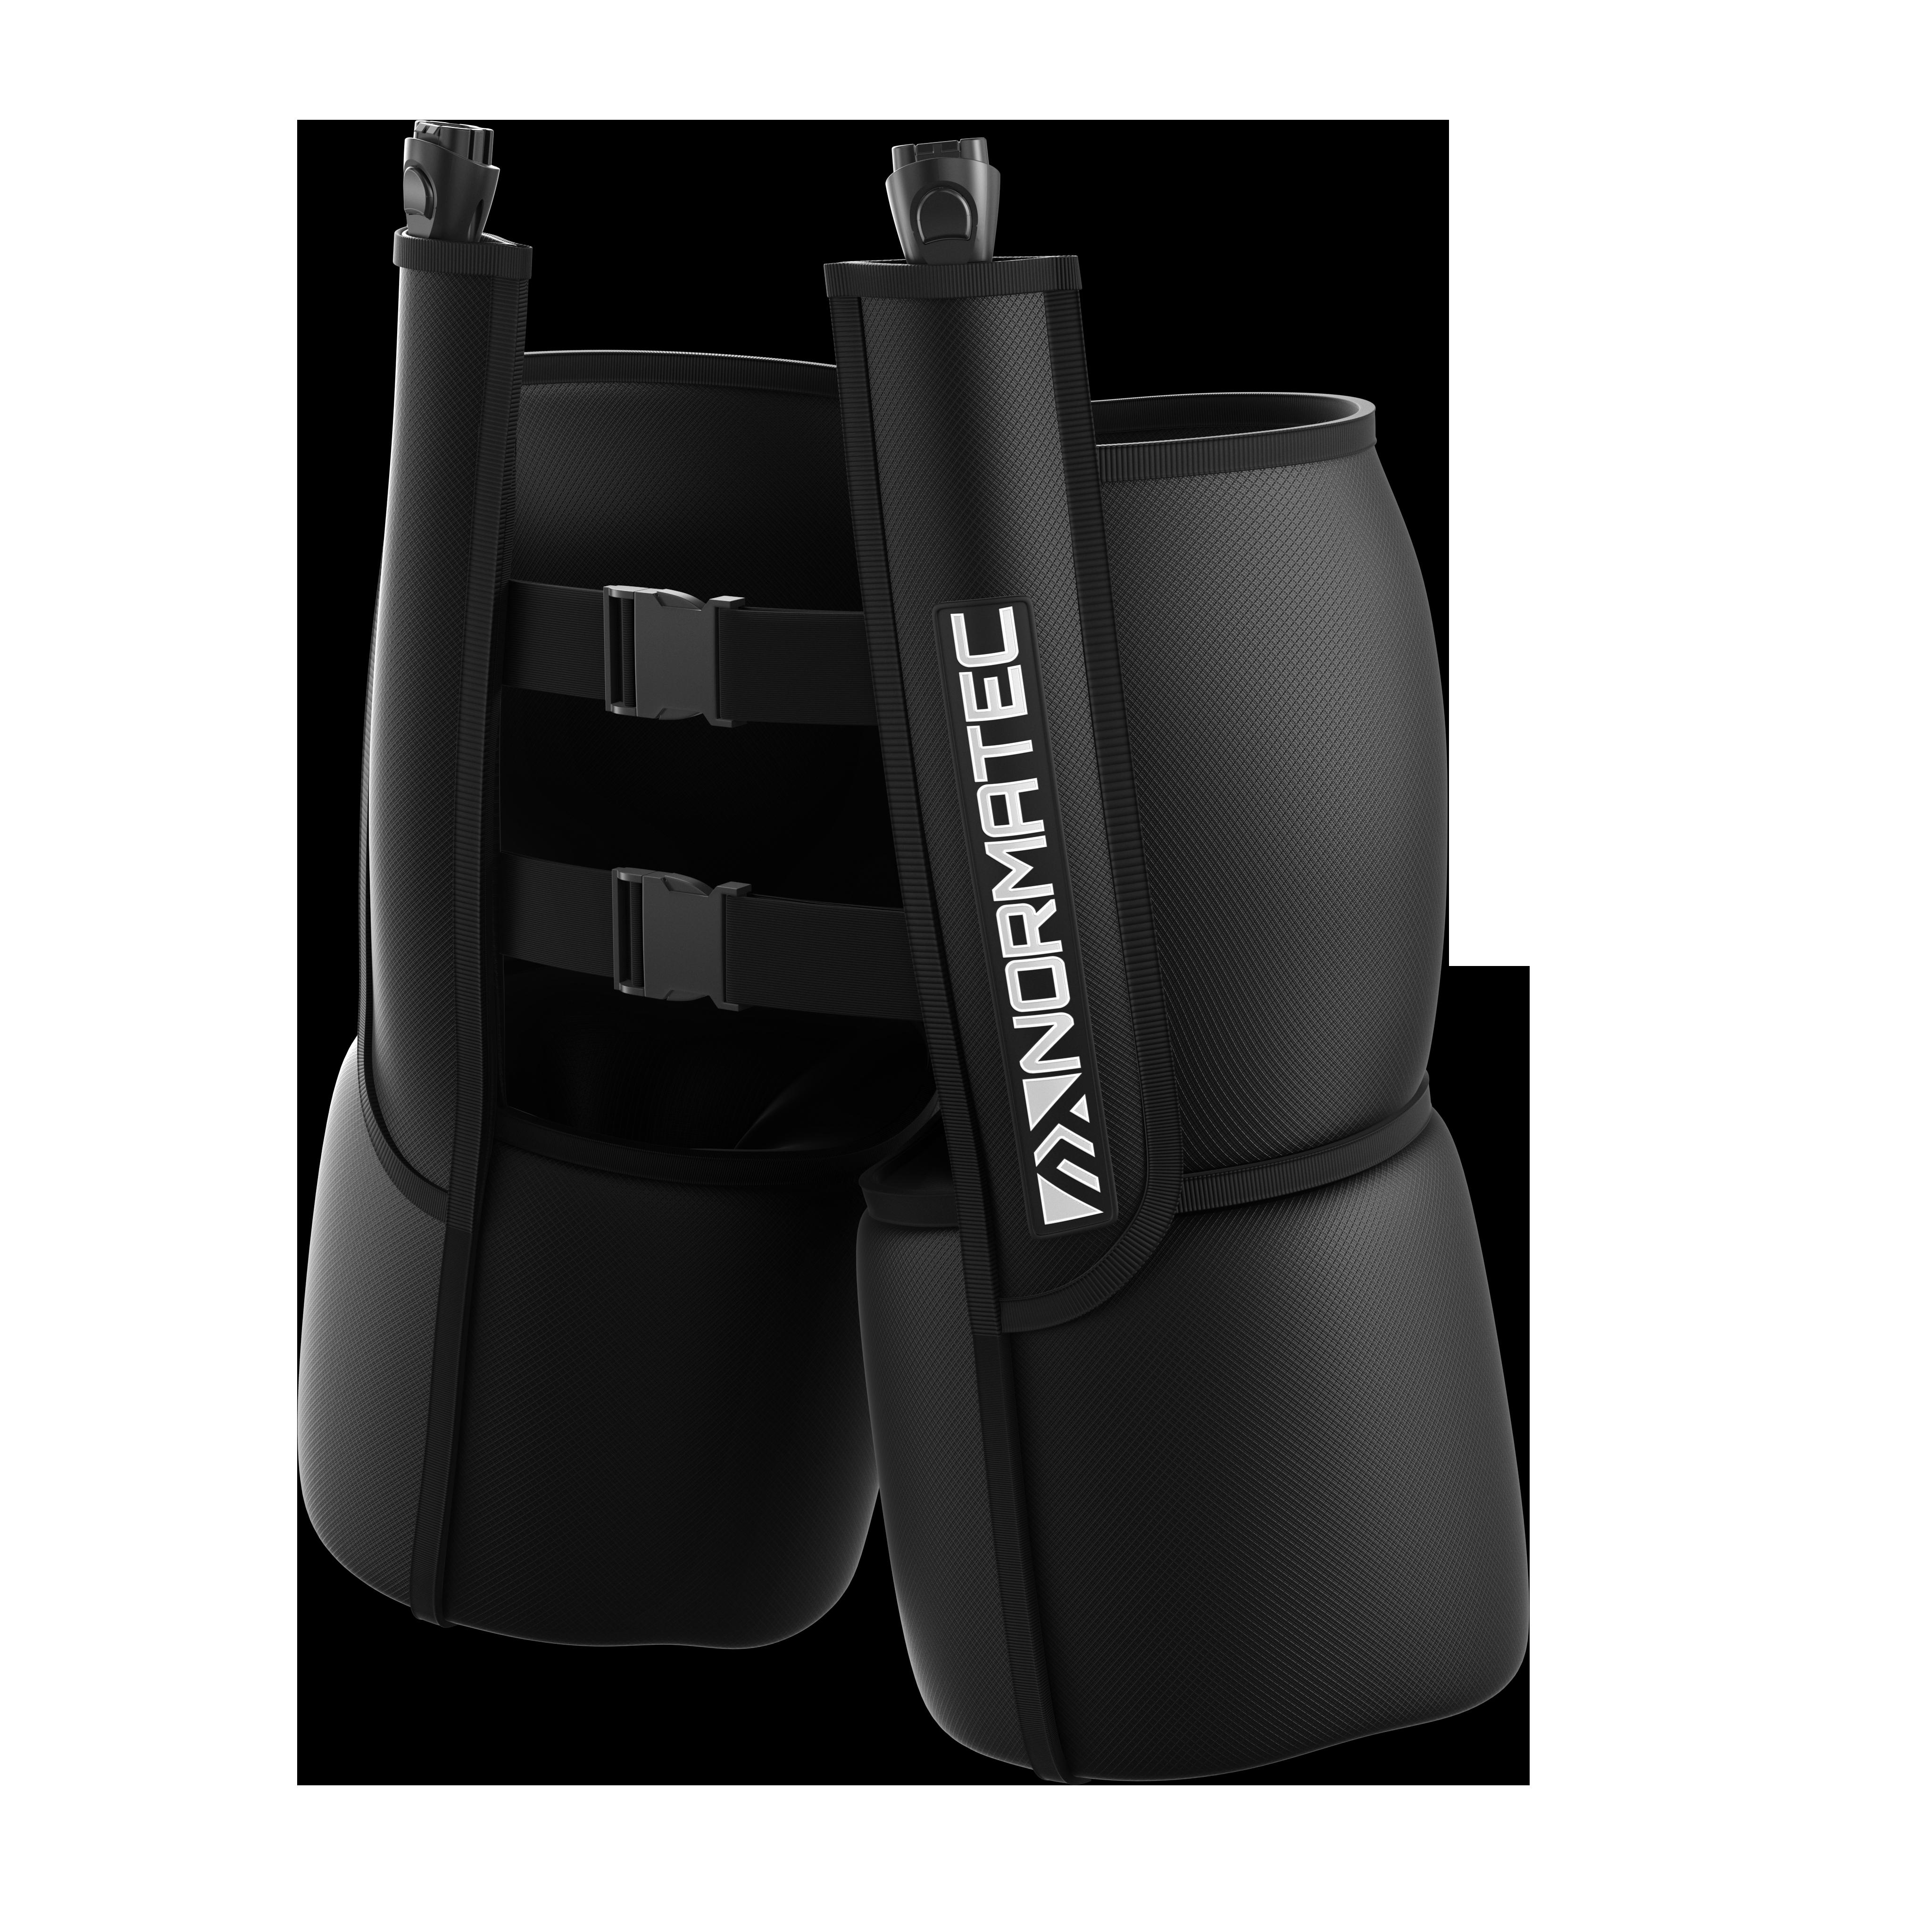 NormaTec 2.0 Leg Recovery System - Hip (Zubehör)